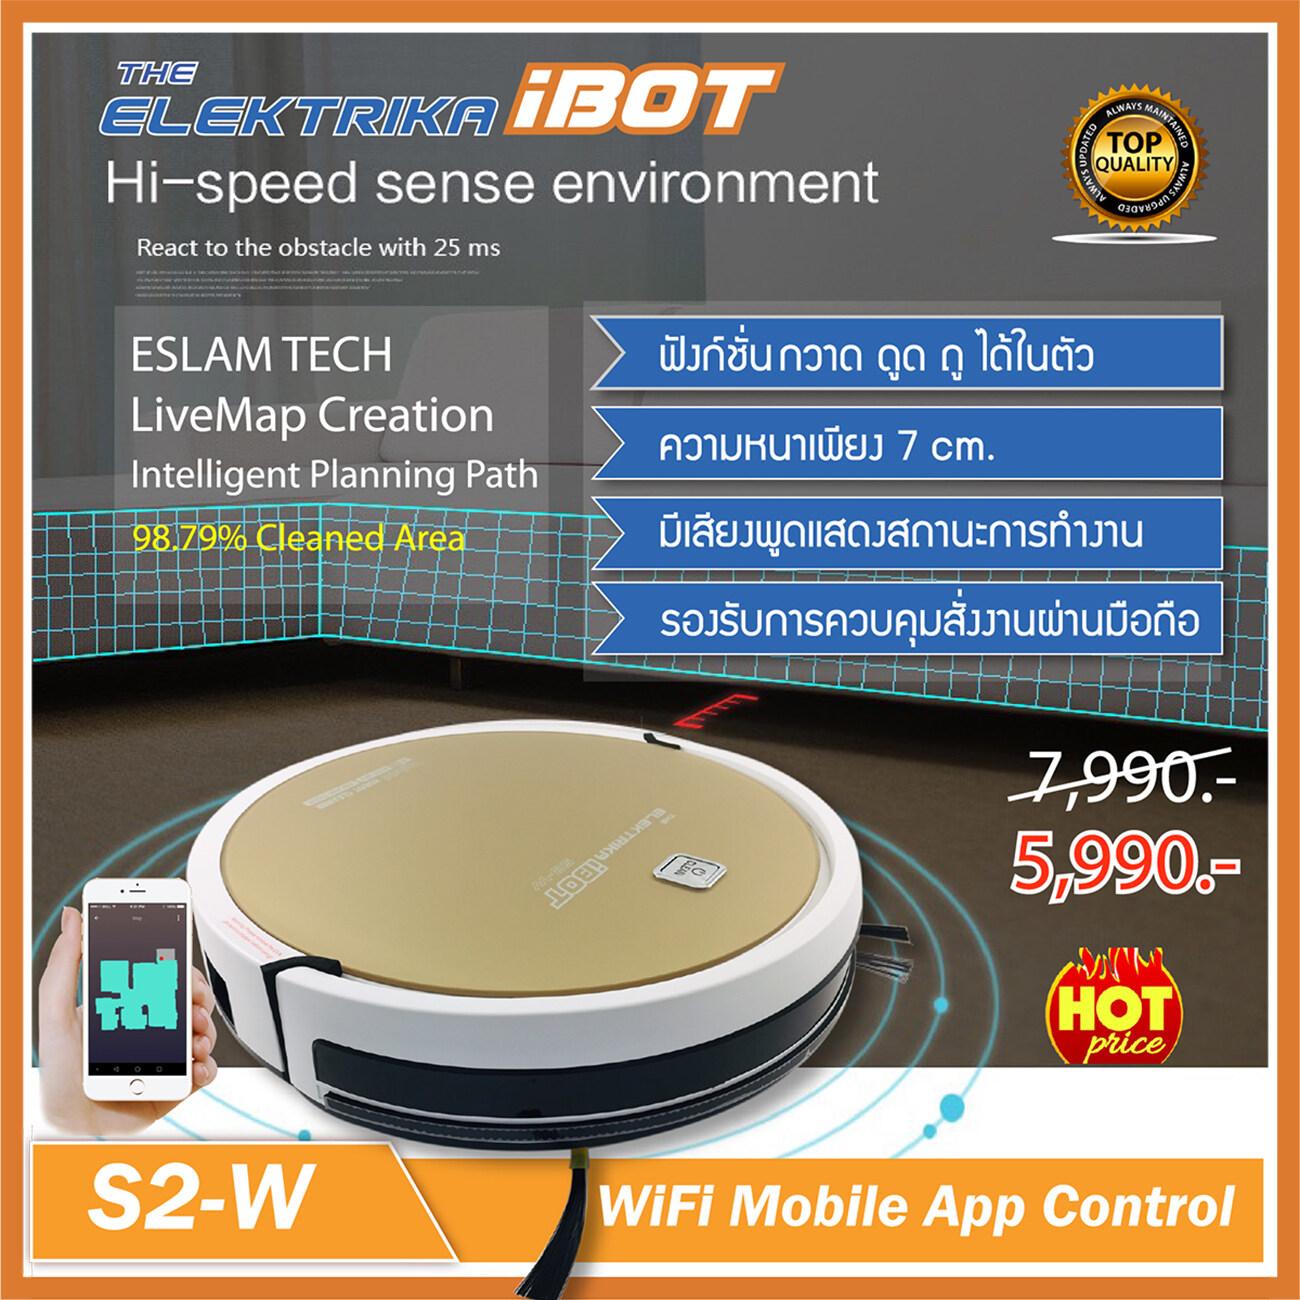 The Elektrika iBOT รุ่น S2-W หุ่นยนต์ดูดฝุ่นระบบ Hybrid Mapping ดูดฝุ่น และ ถูพื้น ในตัว ใช้มอเตอร์และชิพญี่ปุ่น ทำความสะอาดได้ถึง 98.79% ของพื้นที่ เสียงเงียบ (ต่ำกว่า 55 dB) มี WiFi APP สั่งการด้วยโทรศัพท์มือถือ